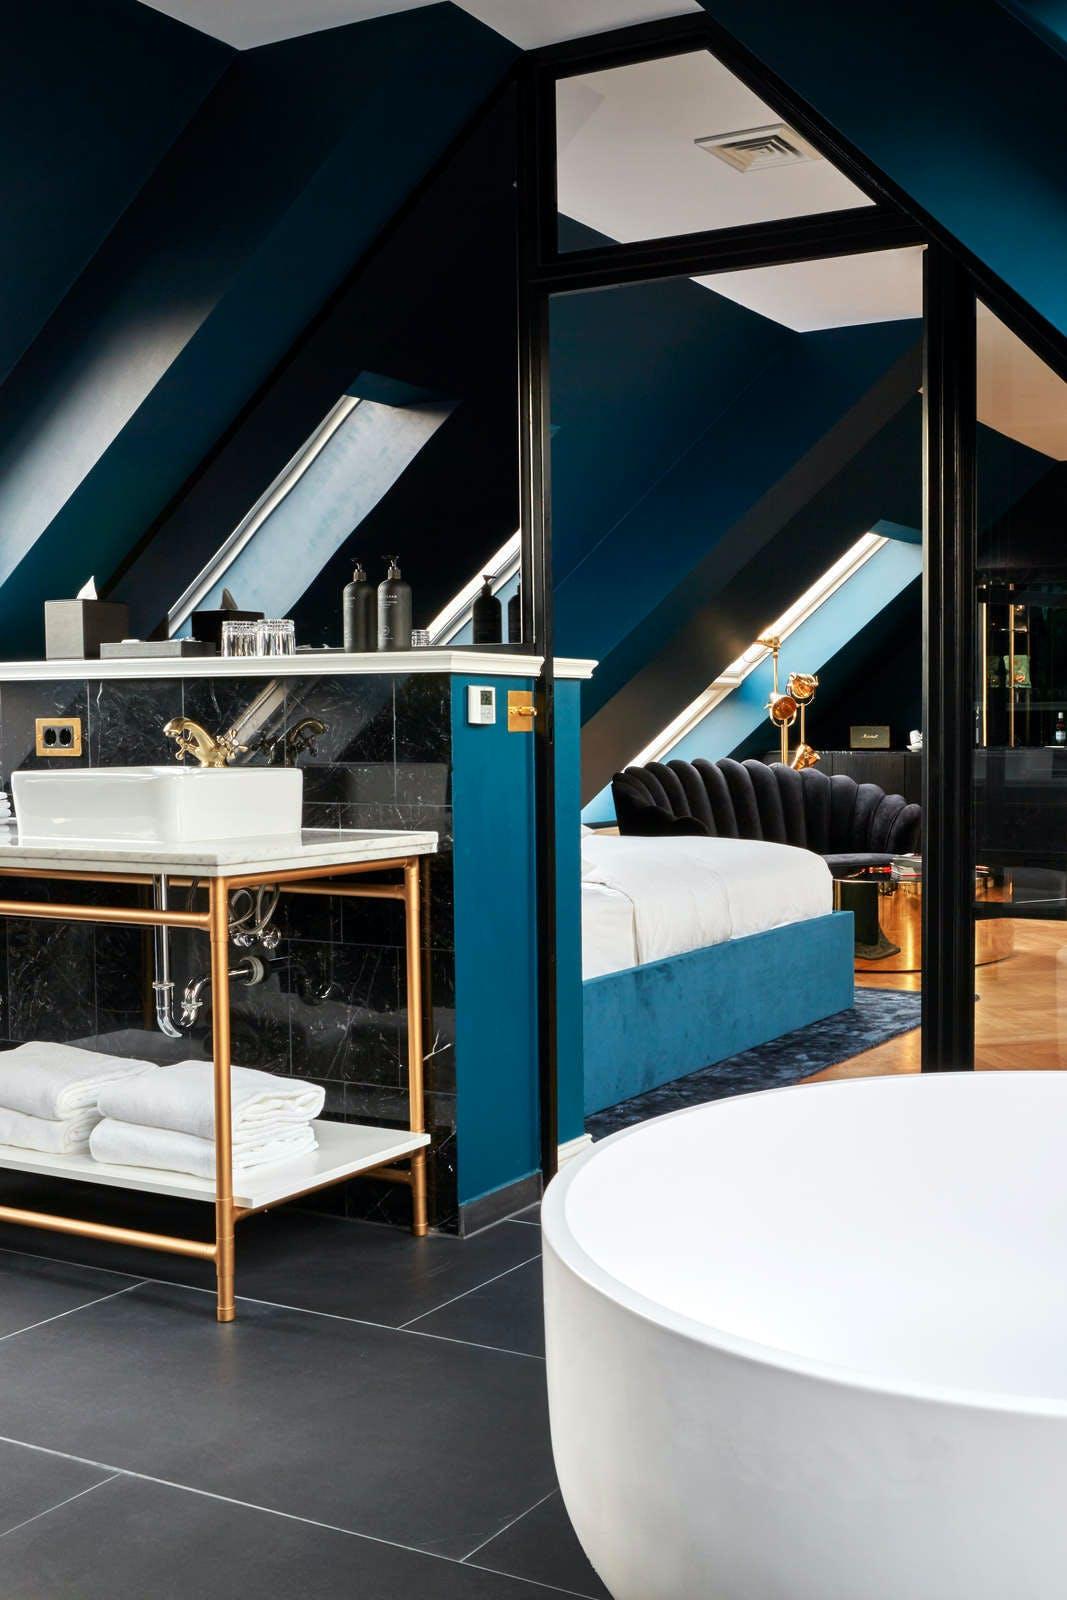 Hotel Provocateur